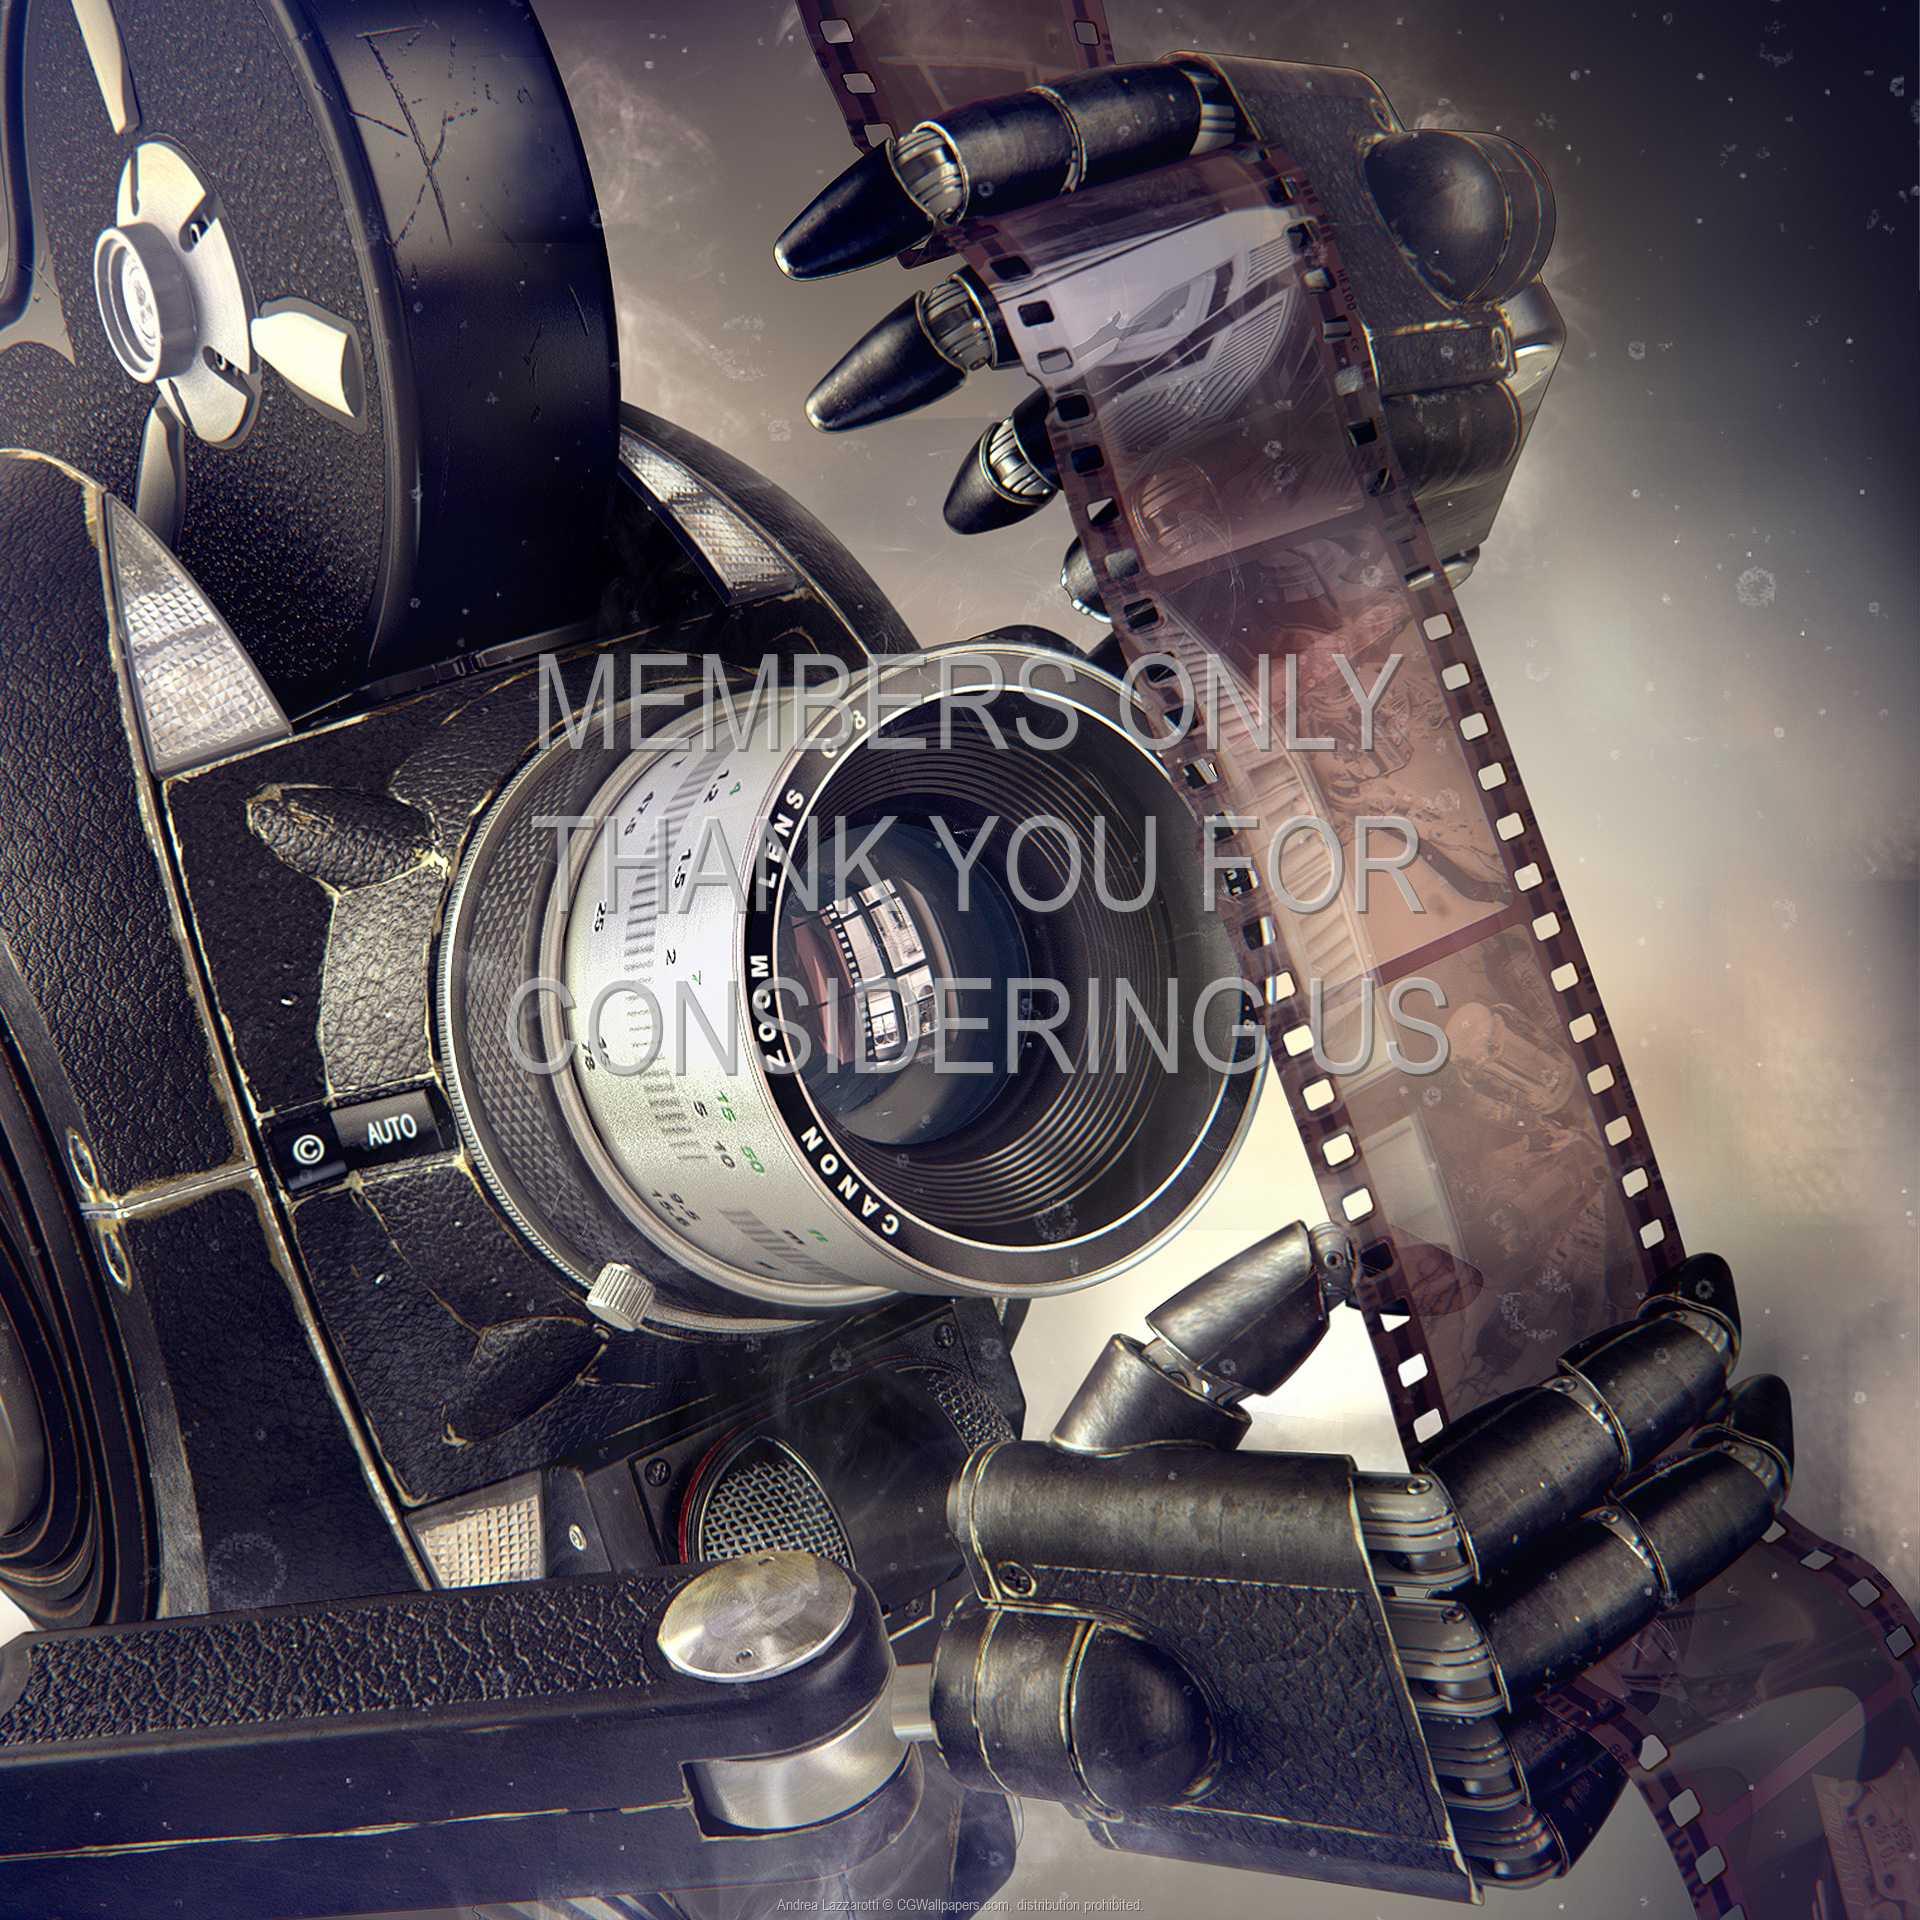 Andrea Lazzarotti 1080p Horizontal Mobile wallpaper or background 02